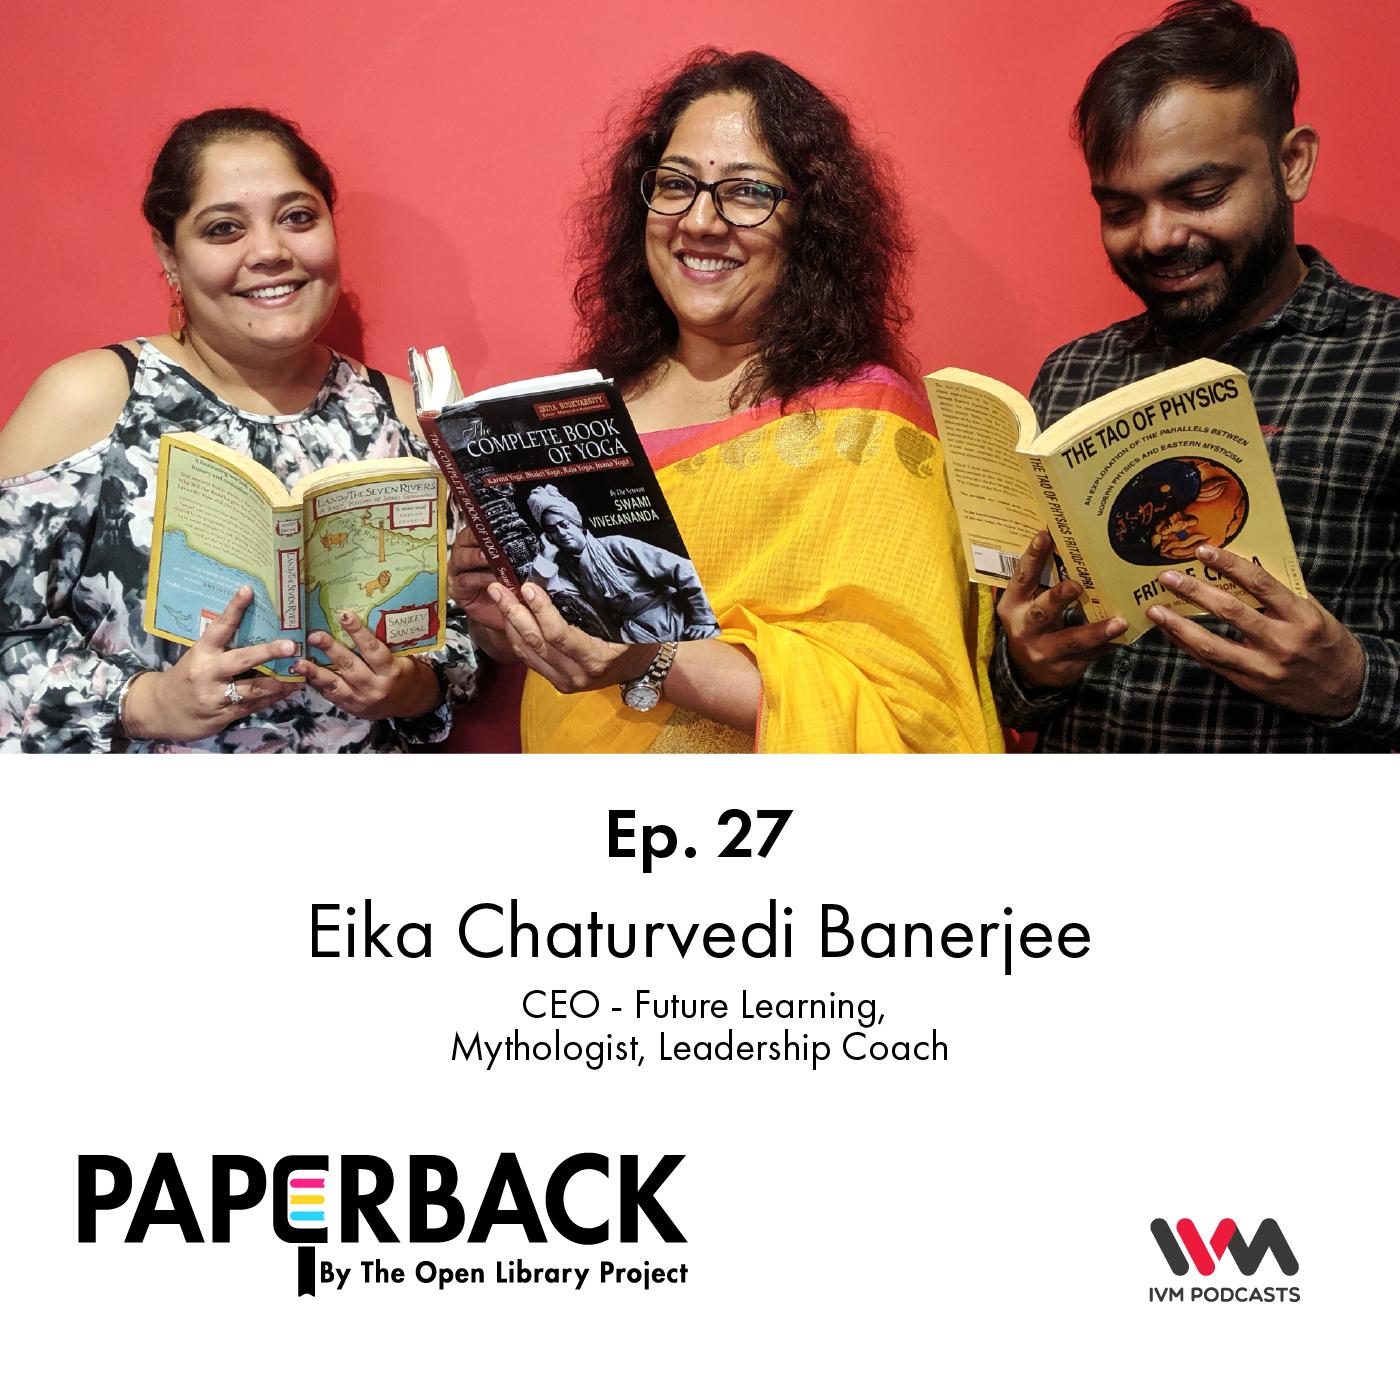 Ep. 27: Eika Chaturvedi Banerjee